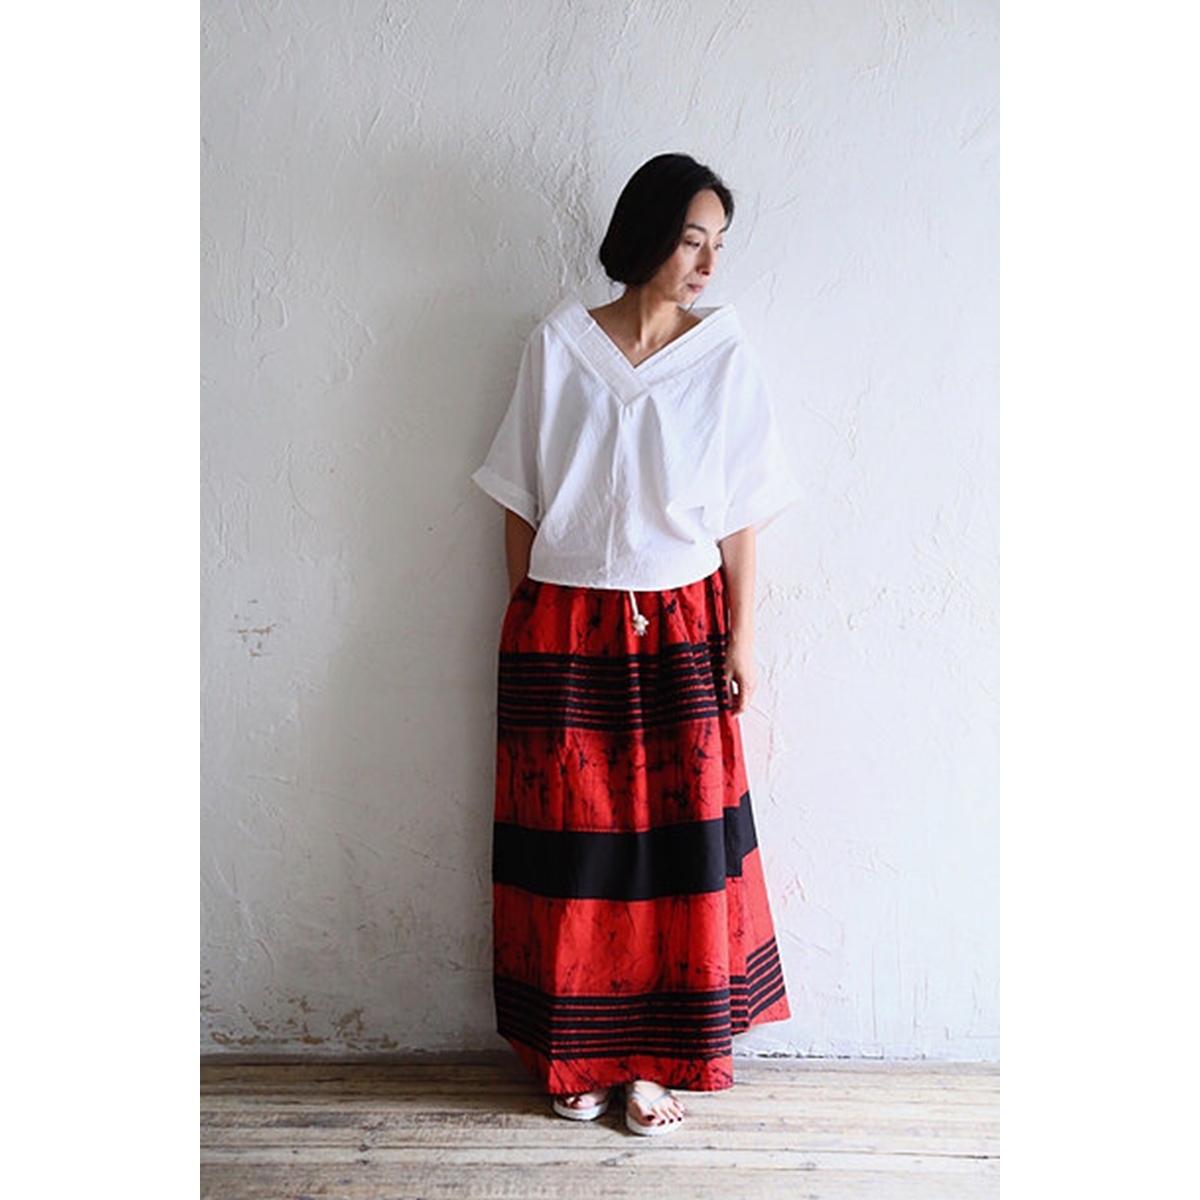 【WOMEN'S】 THE FACTORY バティック スカート (2色 Red×Black/Orange×Black) TF19SS-712 ザファクトリー ろうけつ染め 手作業 ロングスカート 日本製 ウィメンズ レディース 送料無料